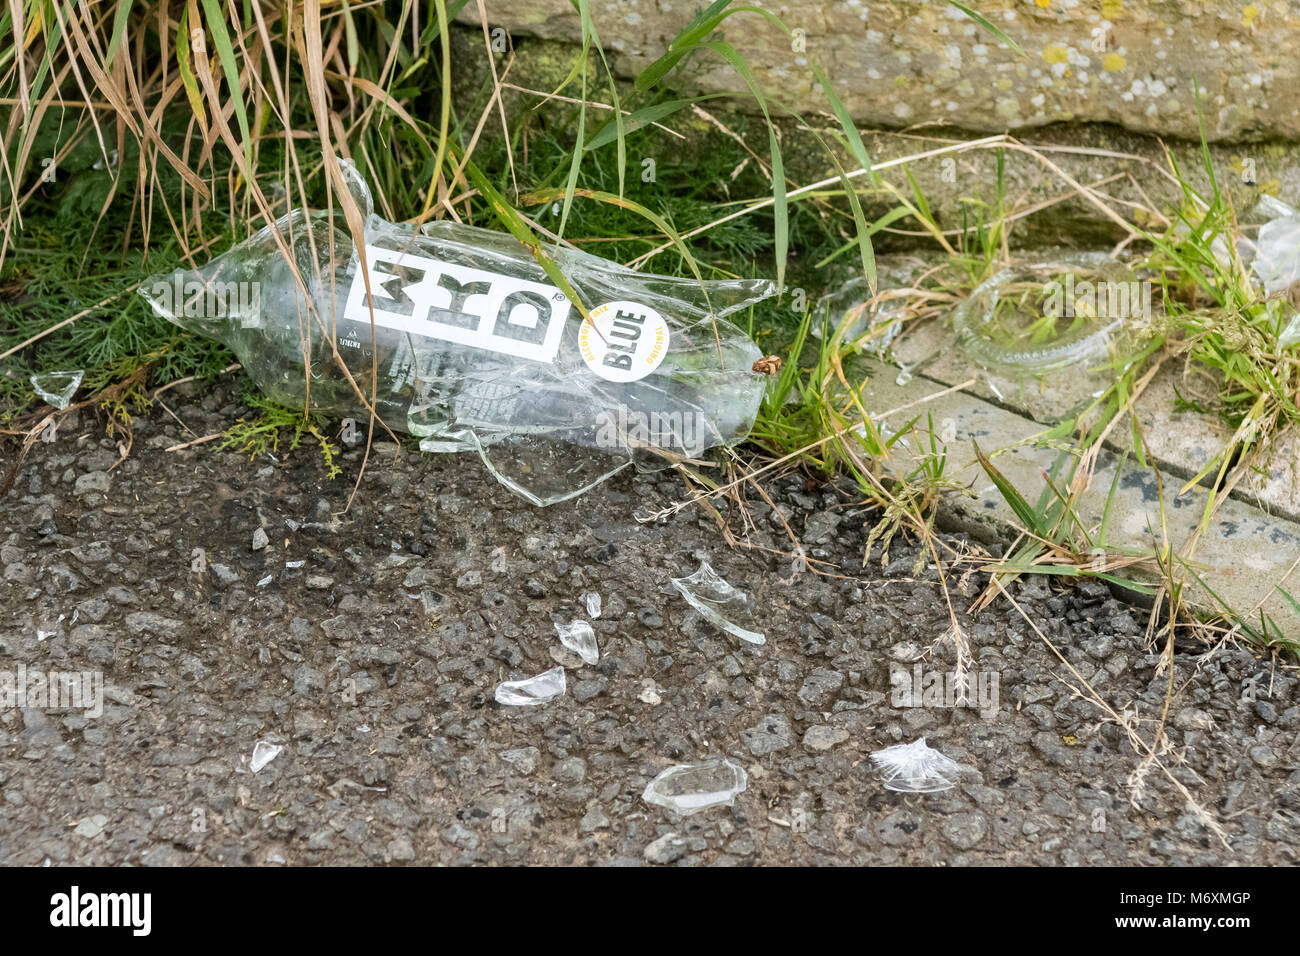 Broken smashed WKD alcohol glass bottle on footpath in Scotland, UK - Stock Image